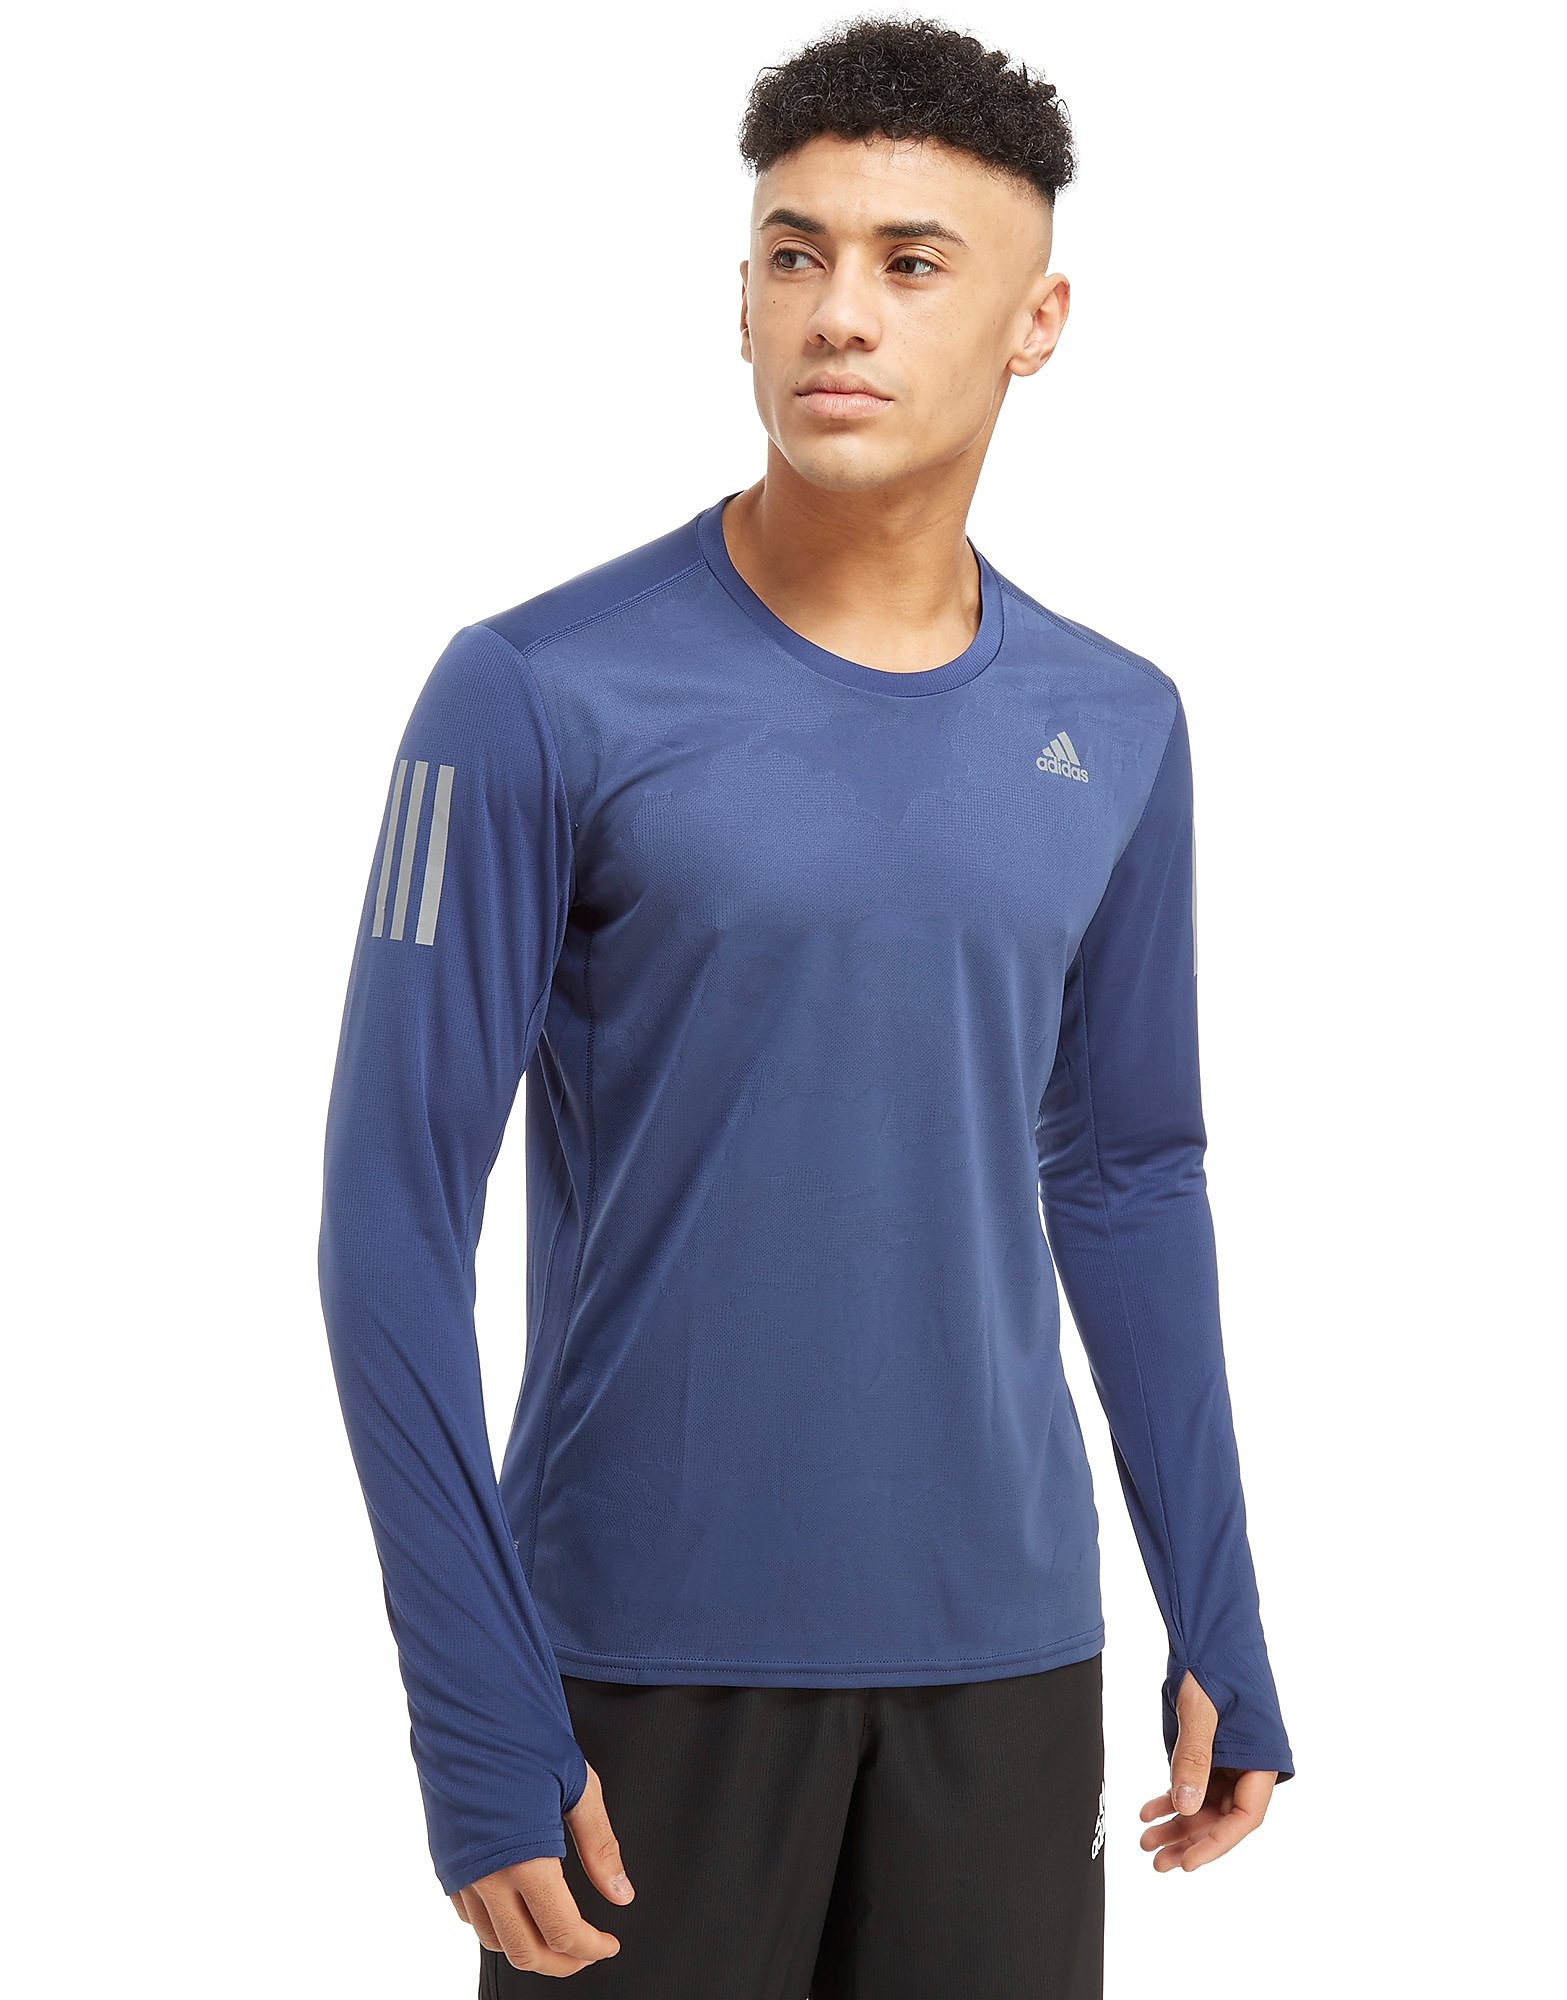 adidas Response Long Sleeve T-Shirt